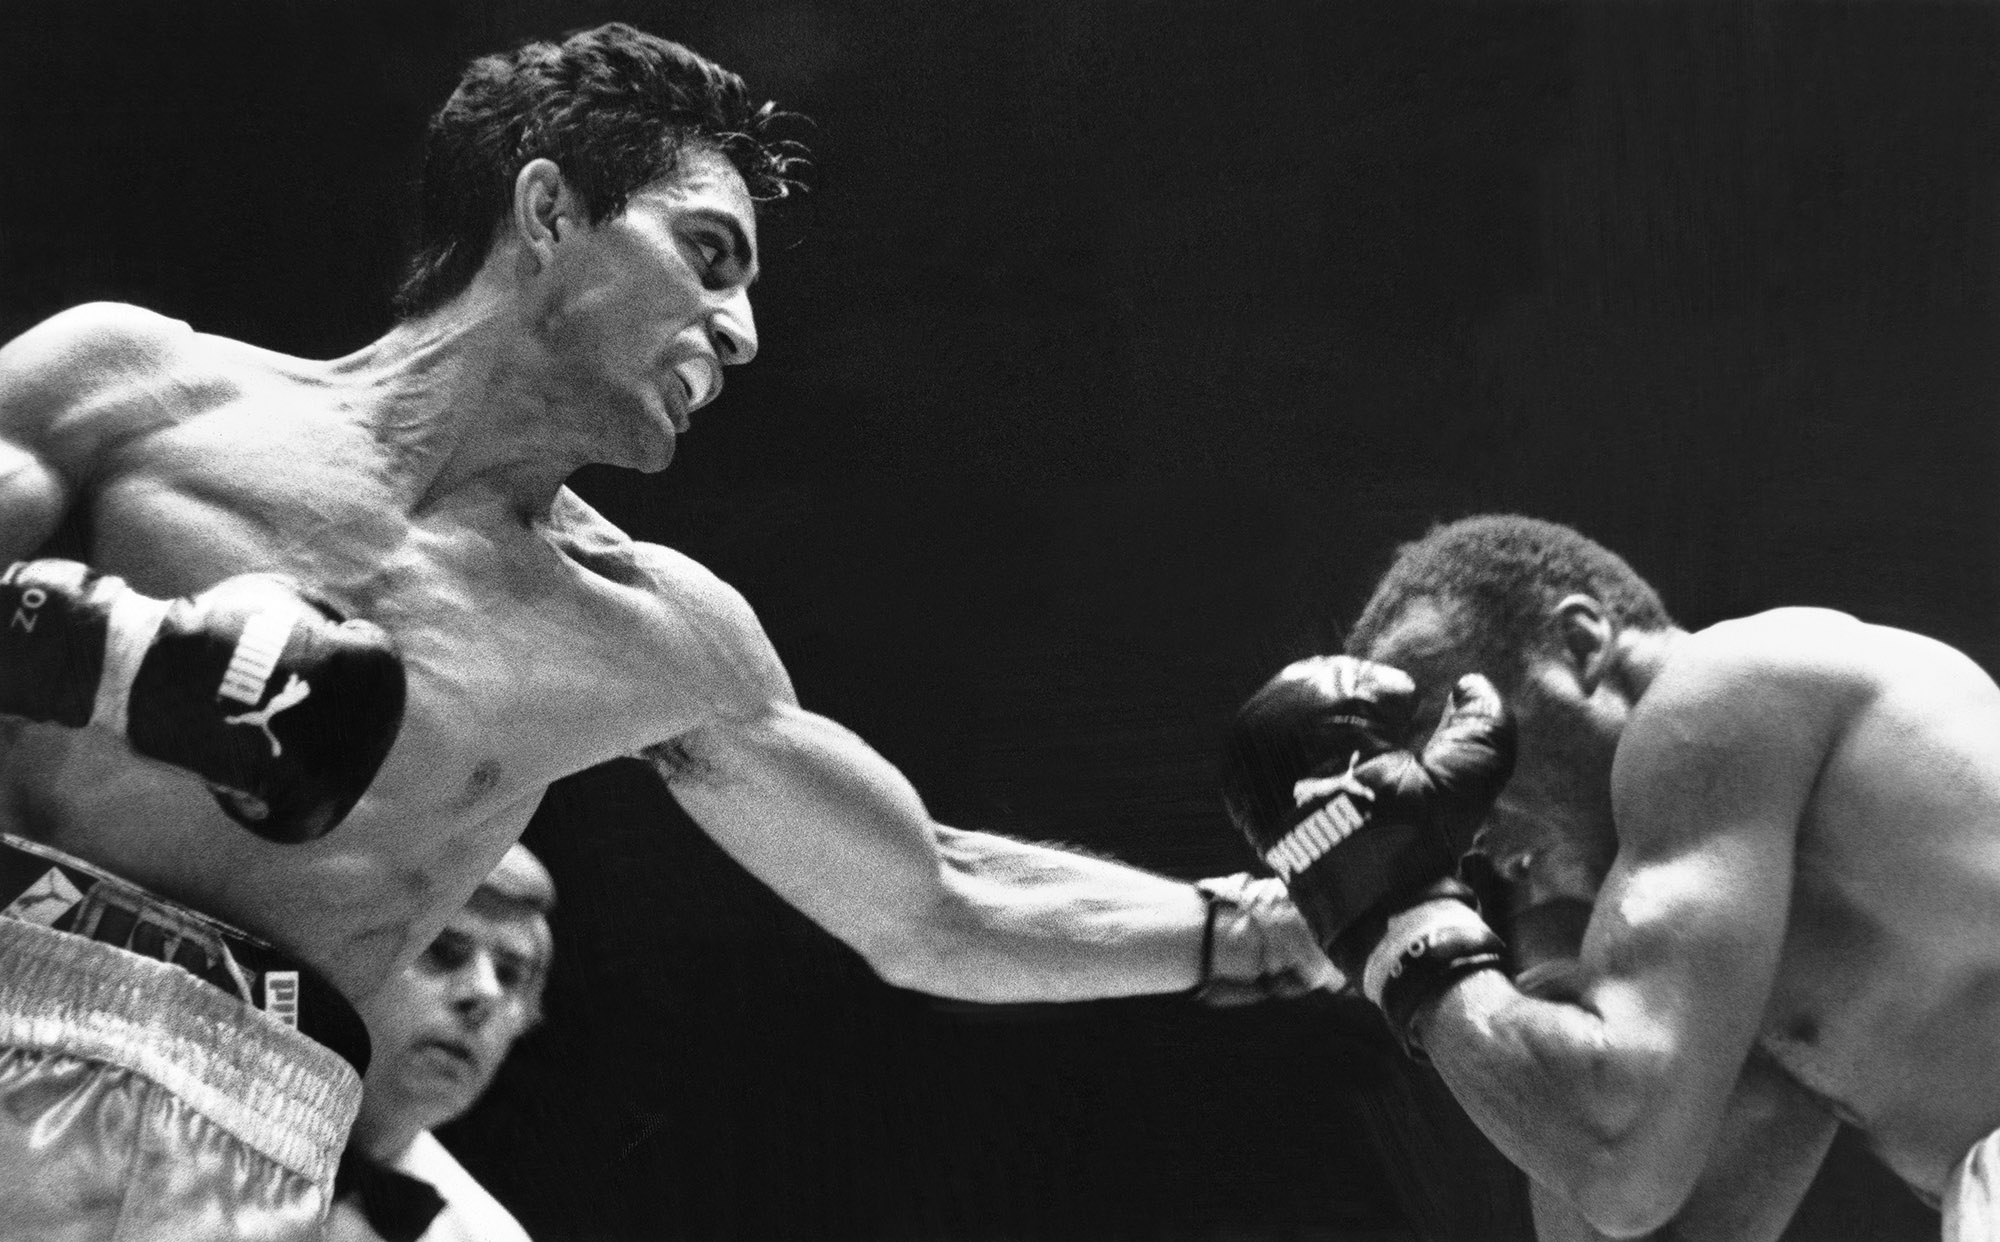 Enrico Scacchia (links) im EM-Kampf im Supermittelgewicht gegen Said Skhouma, 30 November 1985 in Genf.